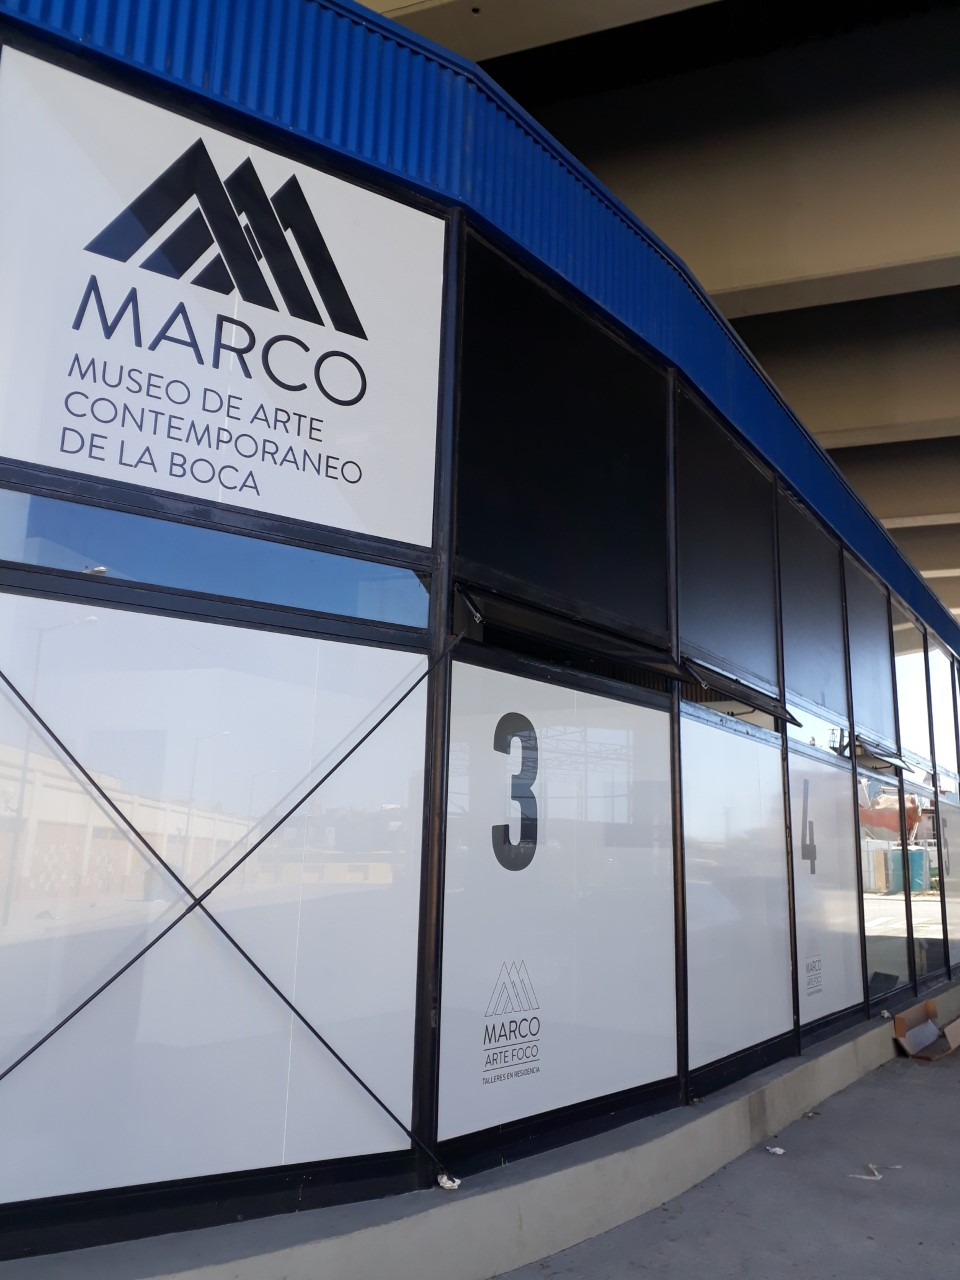 MARCO, un nuevo museo de arte ilumina La Boca - MALALAMAGNA